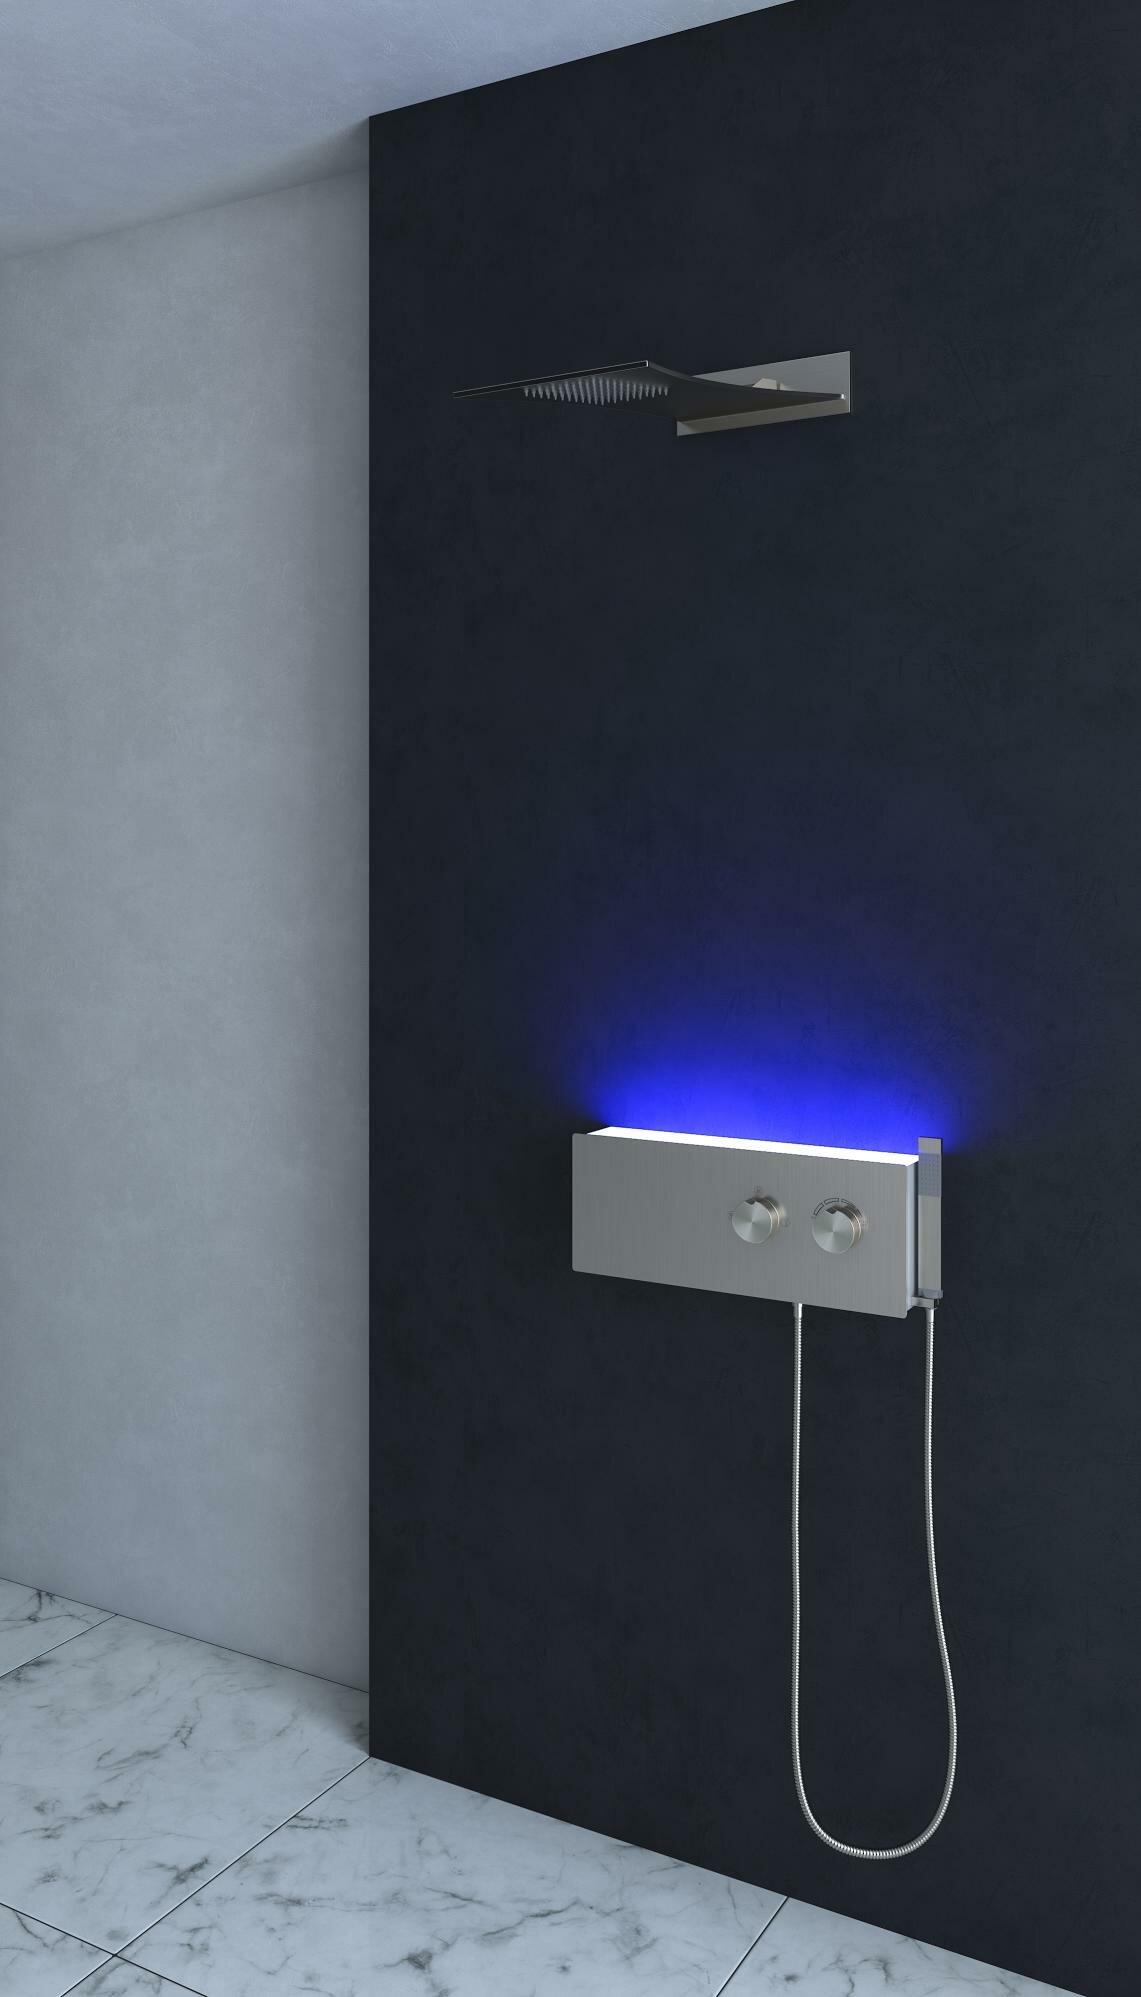 Nezza Mia Thermostatic LED Rain Shower Head Shower Panel | Wayfair